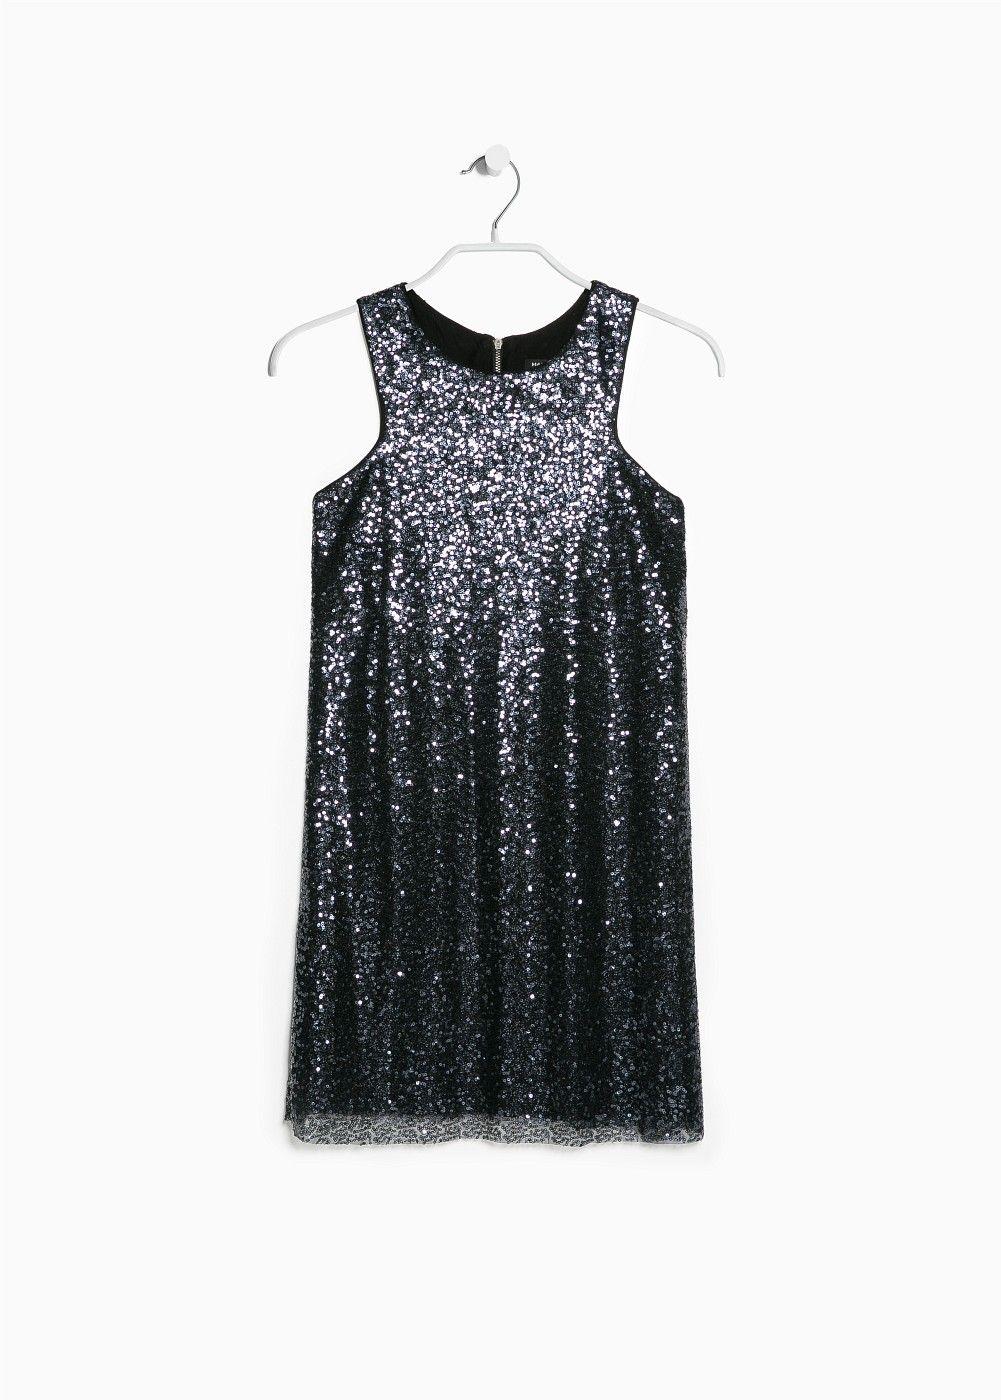 Sequined shift dress - Dresses for Women | MANGO